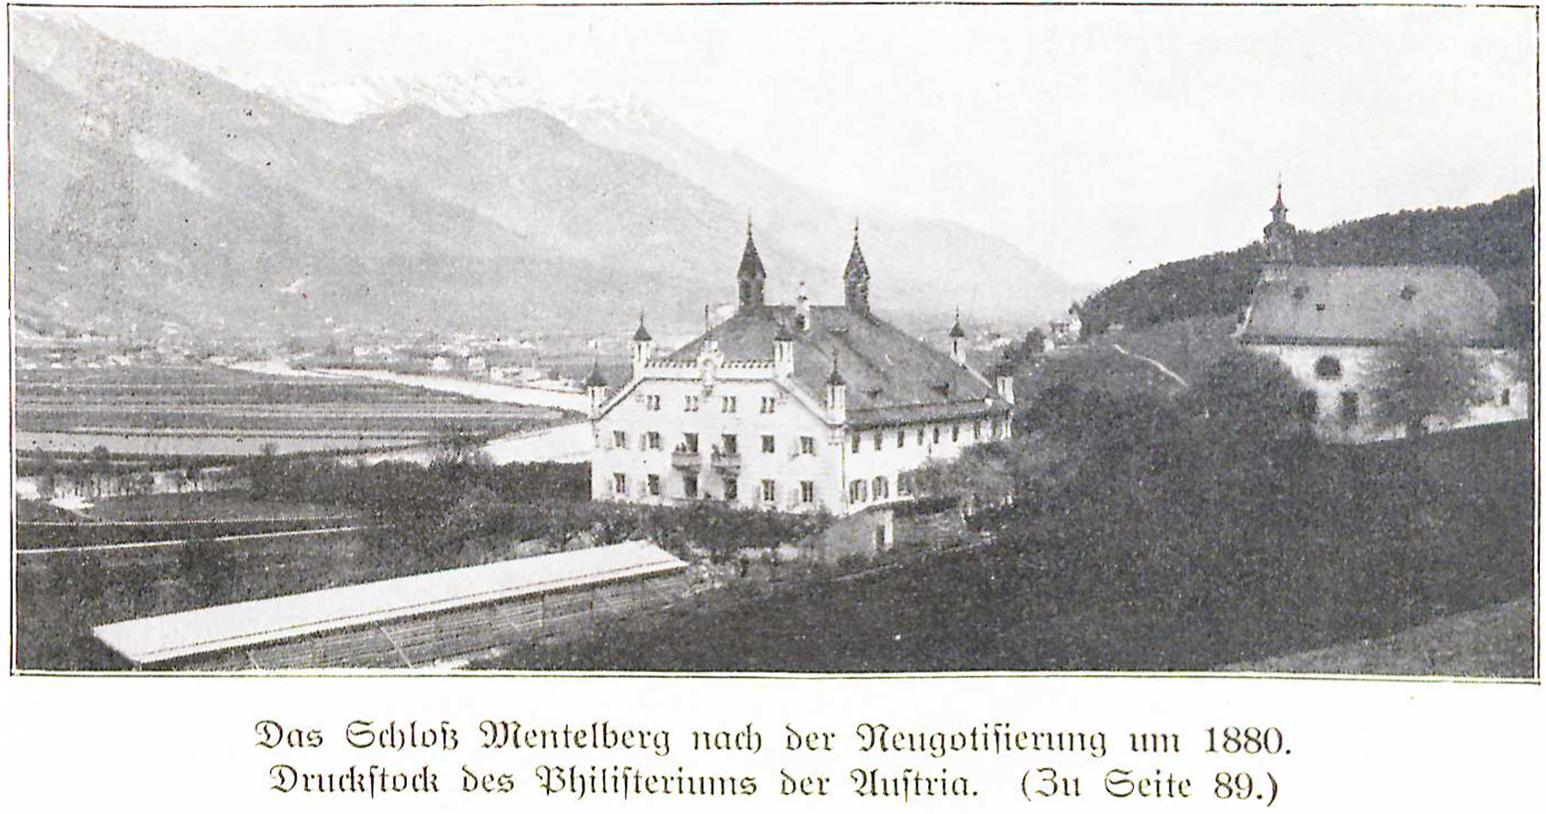 Mentelberg 1880